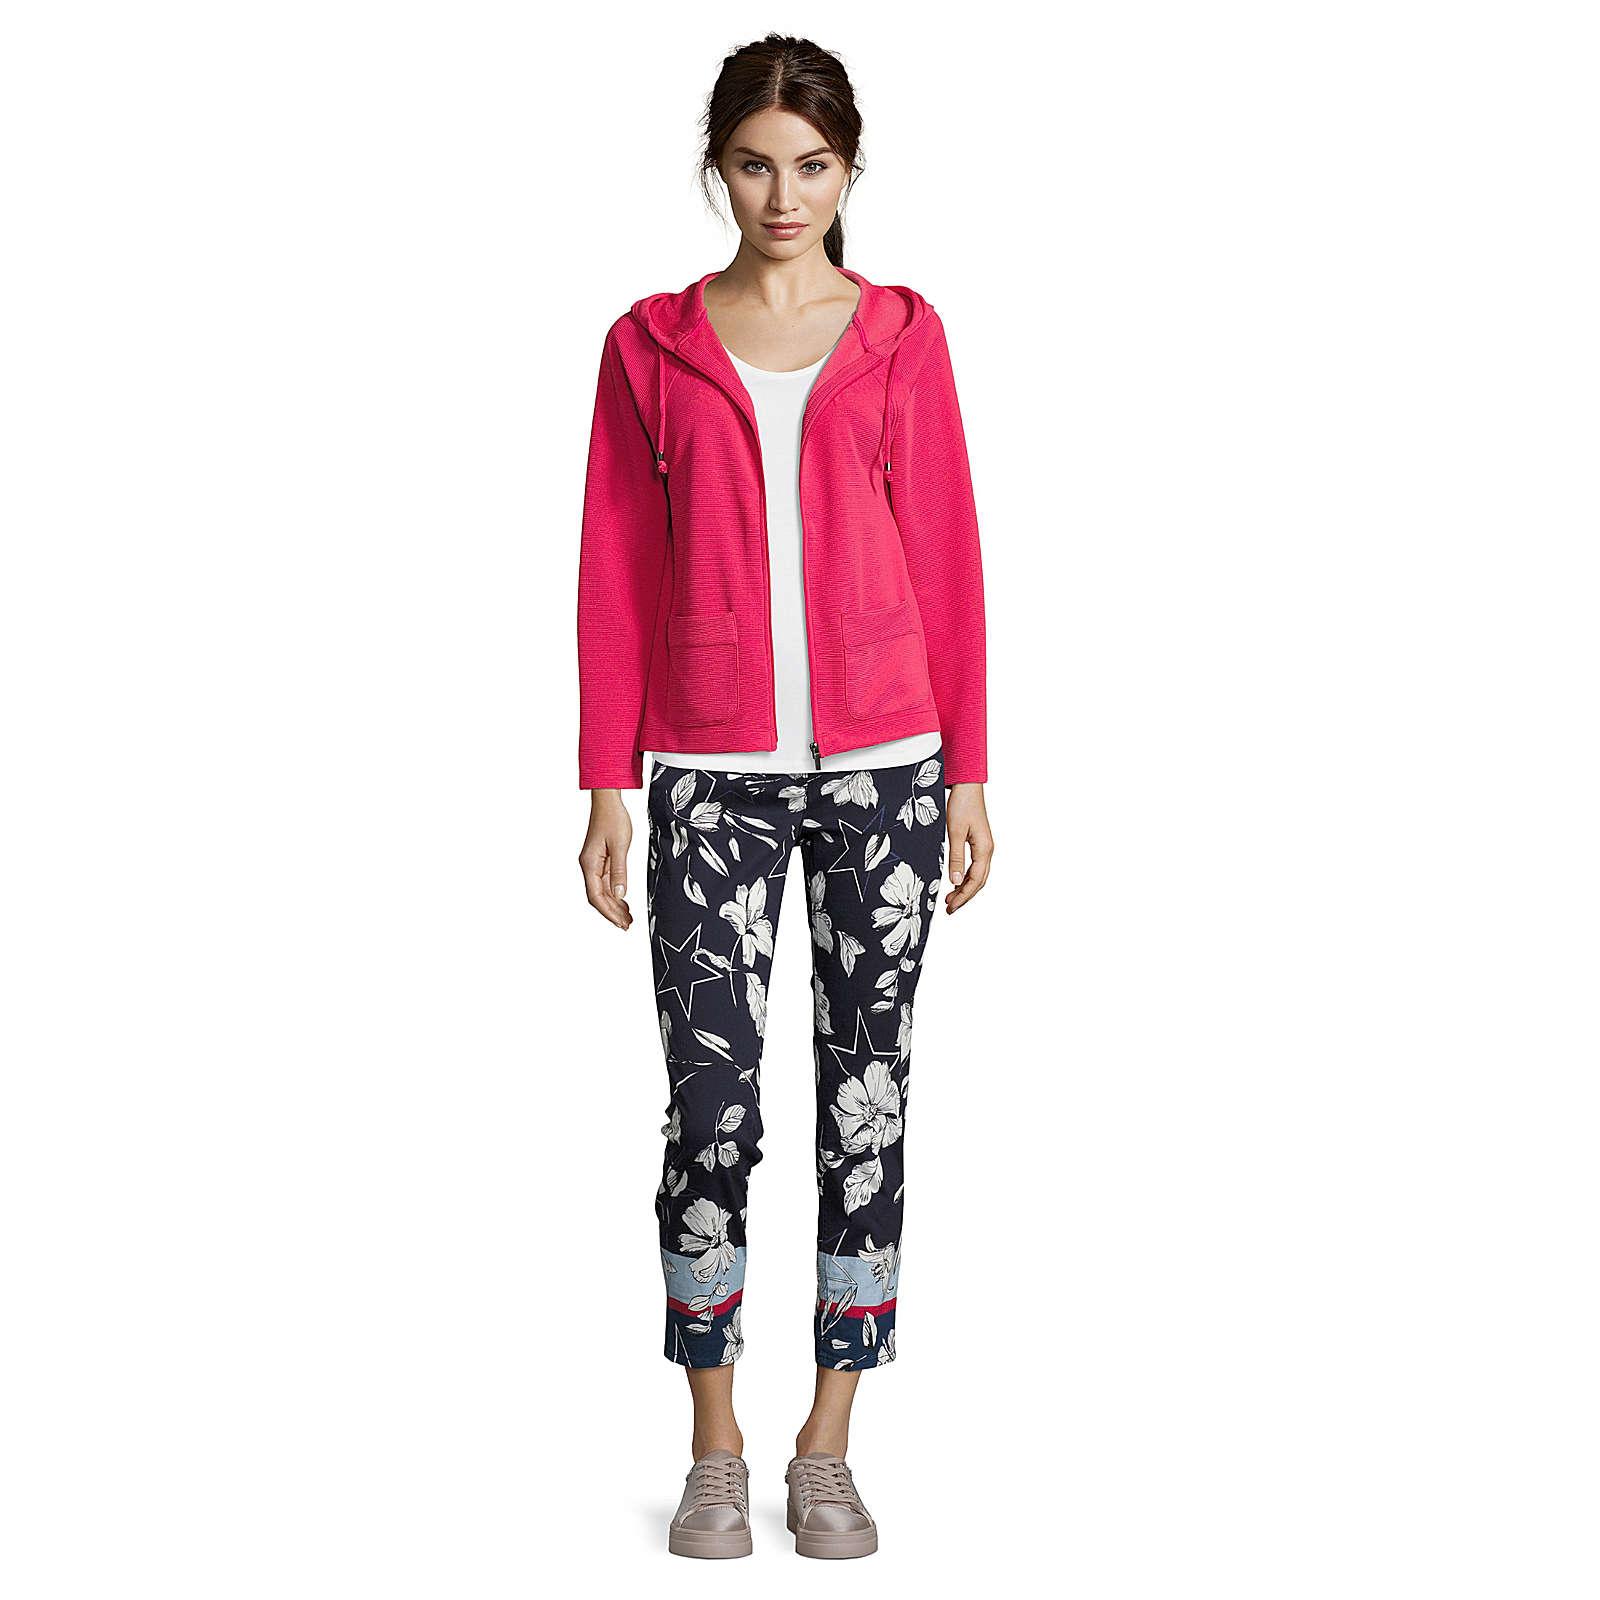 Betty & Co Sweatshirt-Jacke Sweatblazer mehrfarbig Damen Gr. 40